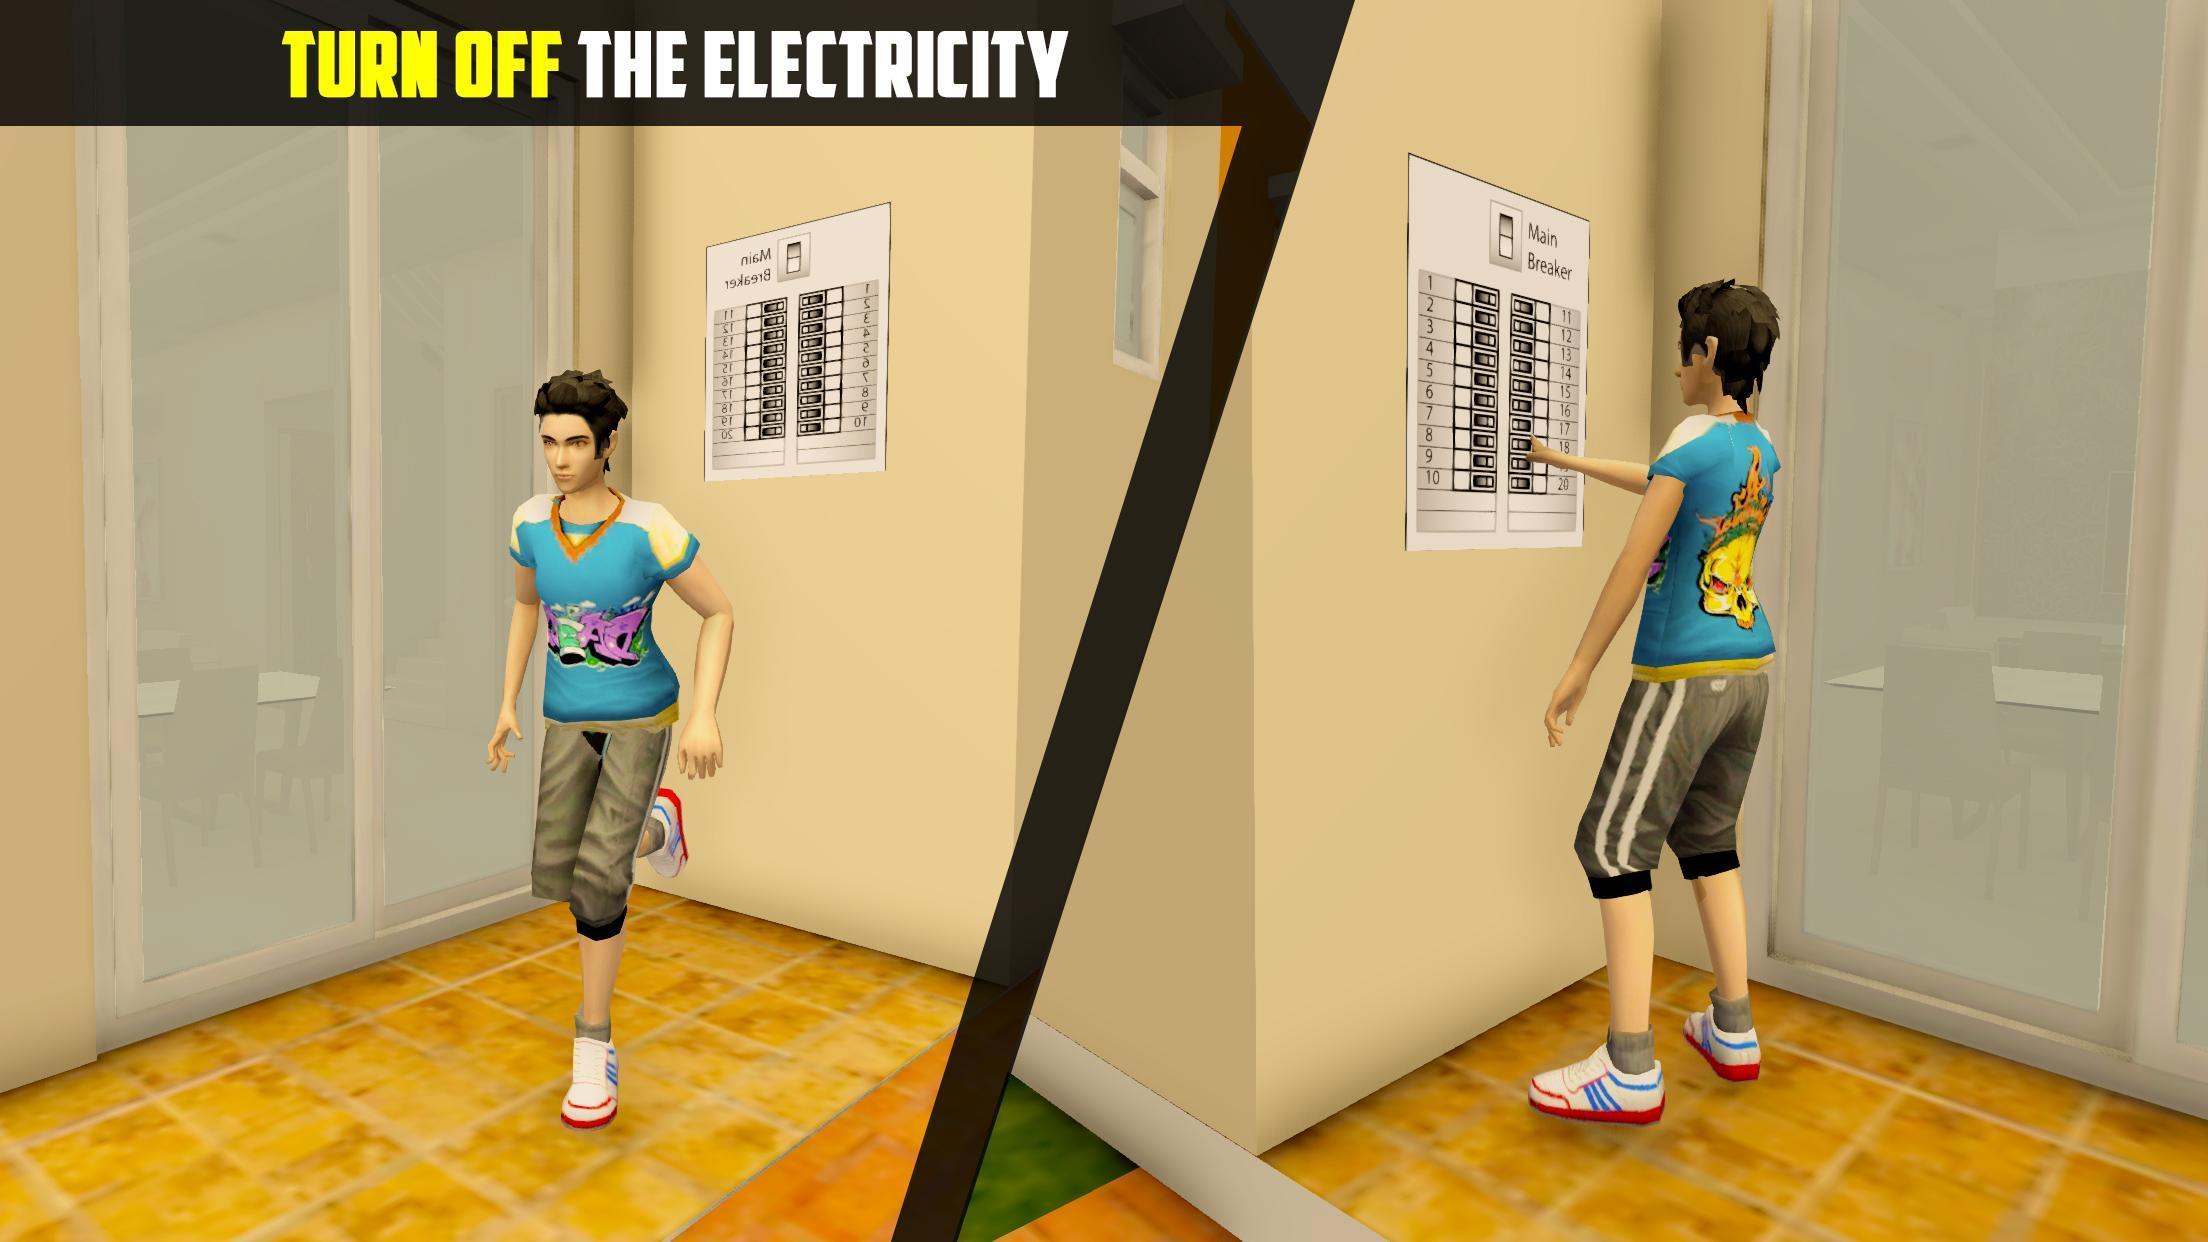 Virtual Bully Boys Next Angry Neighbor 1.4 Screenshot 9